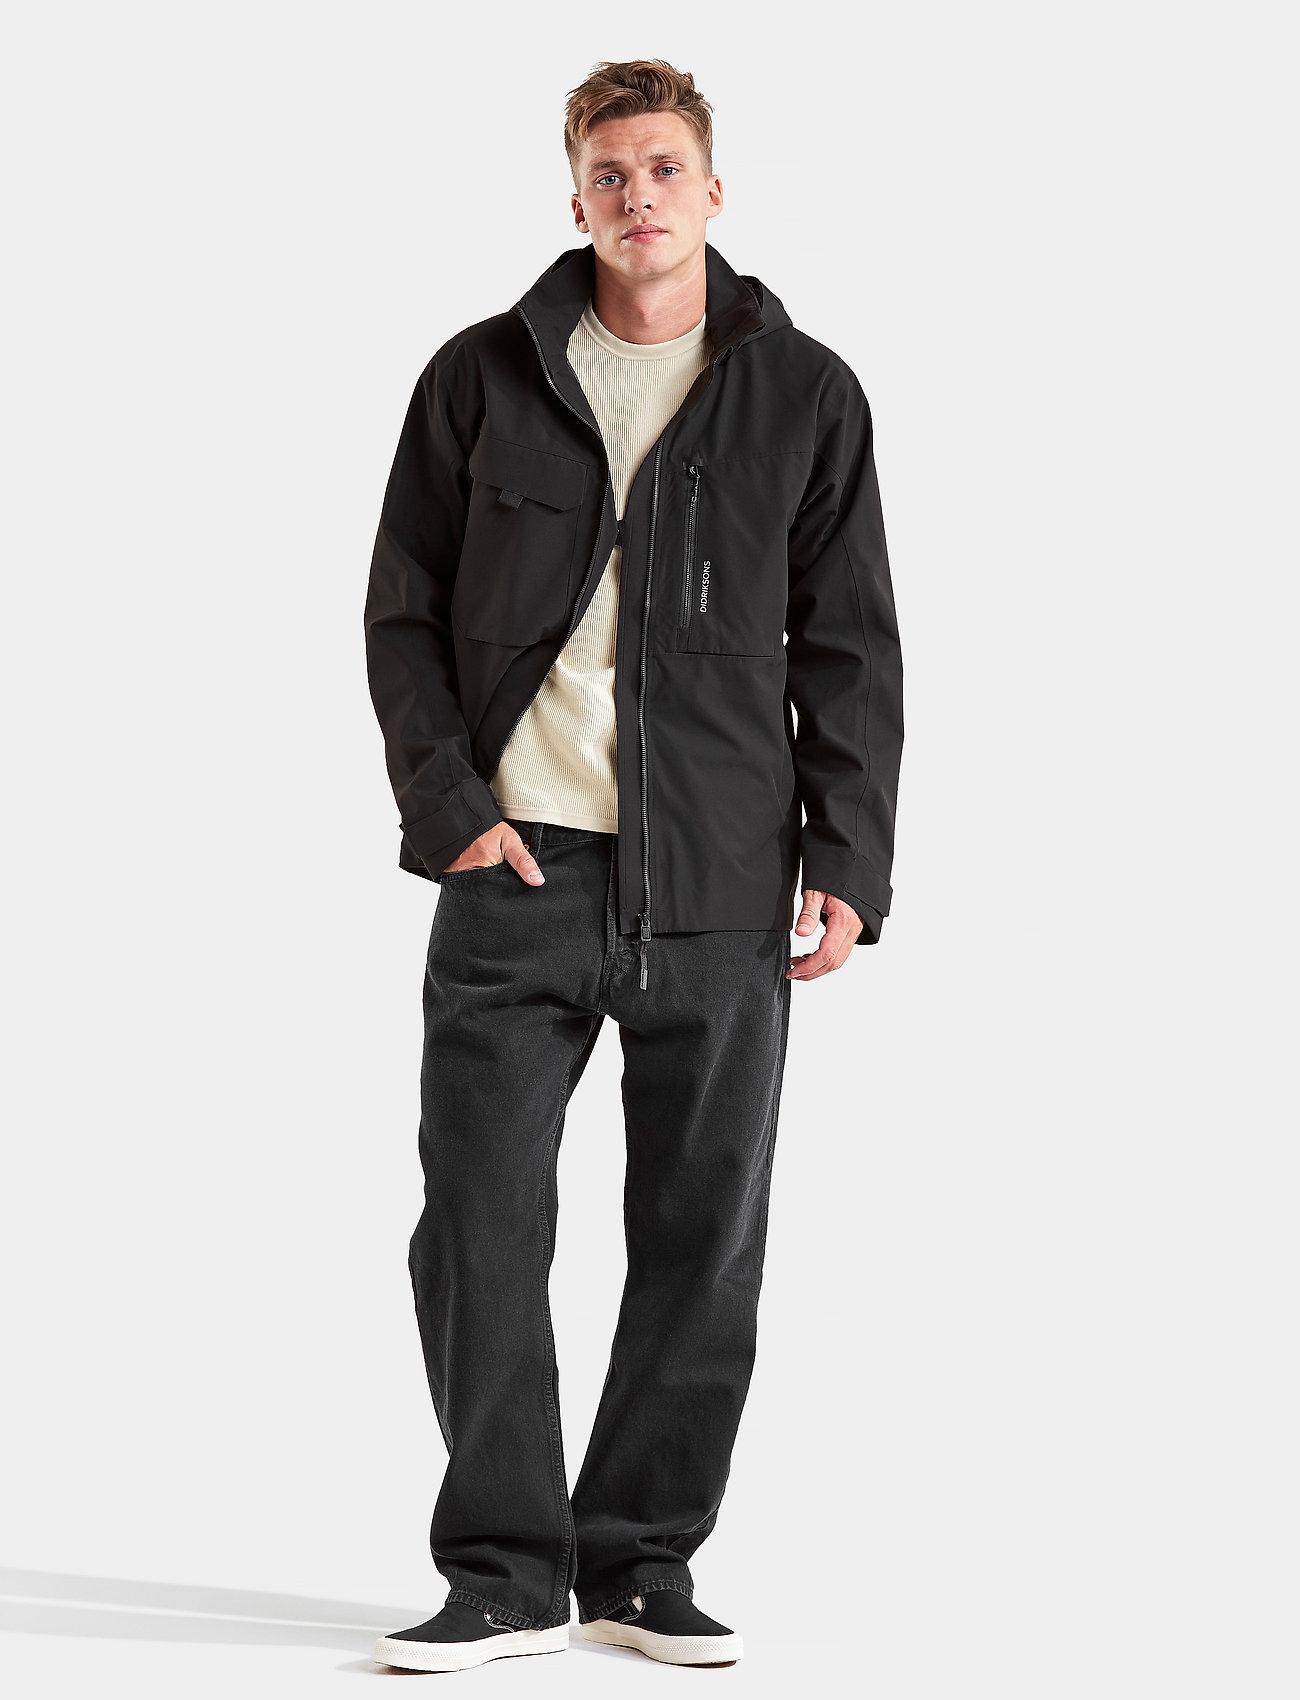 Didriksons - ASTON USX JKT 2 - vestes légères - black - 0